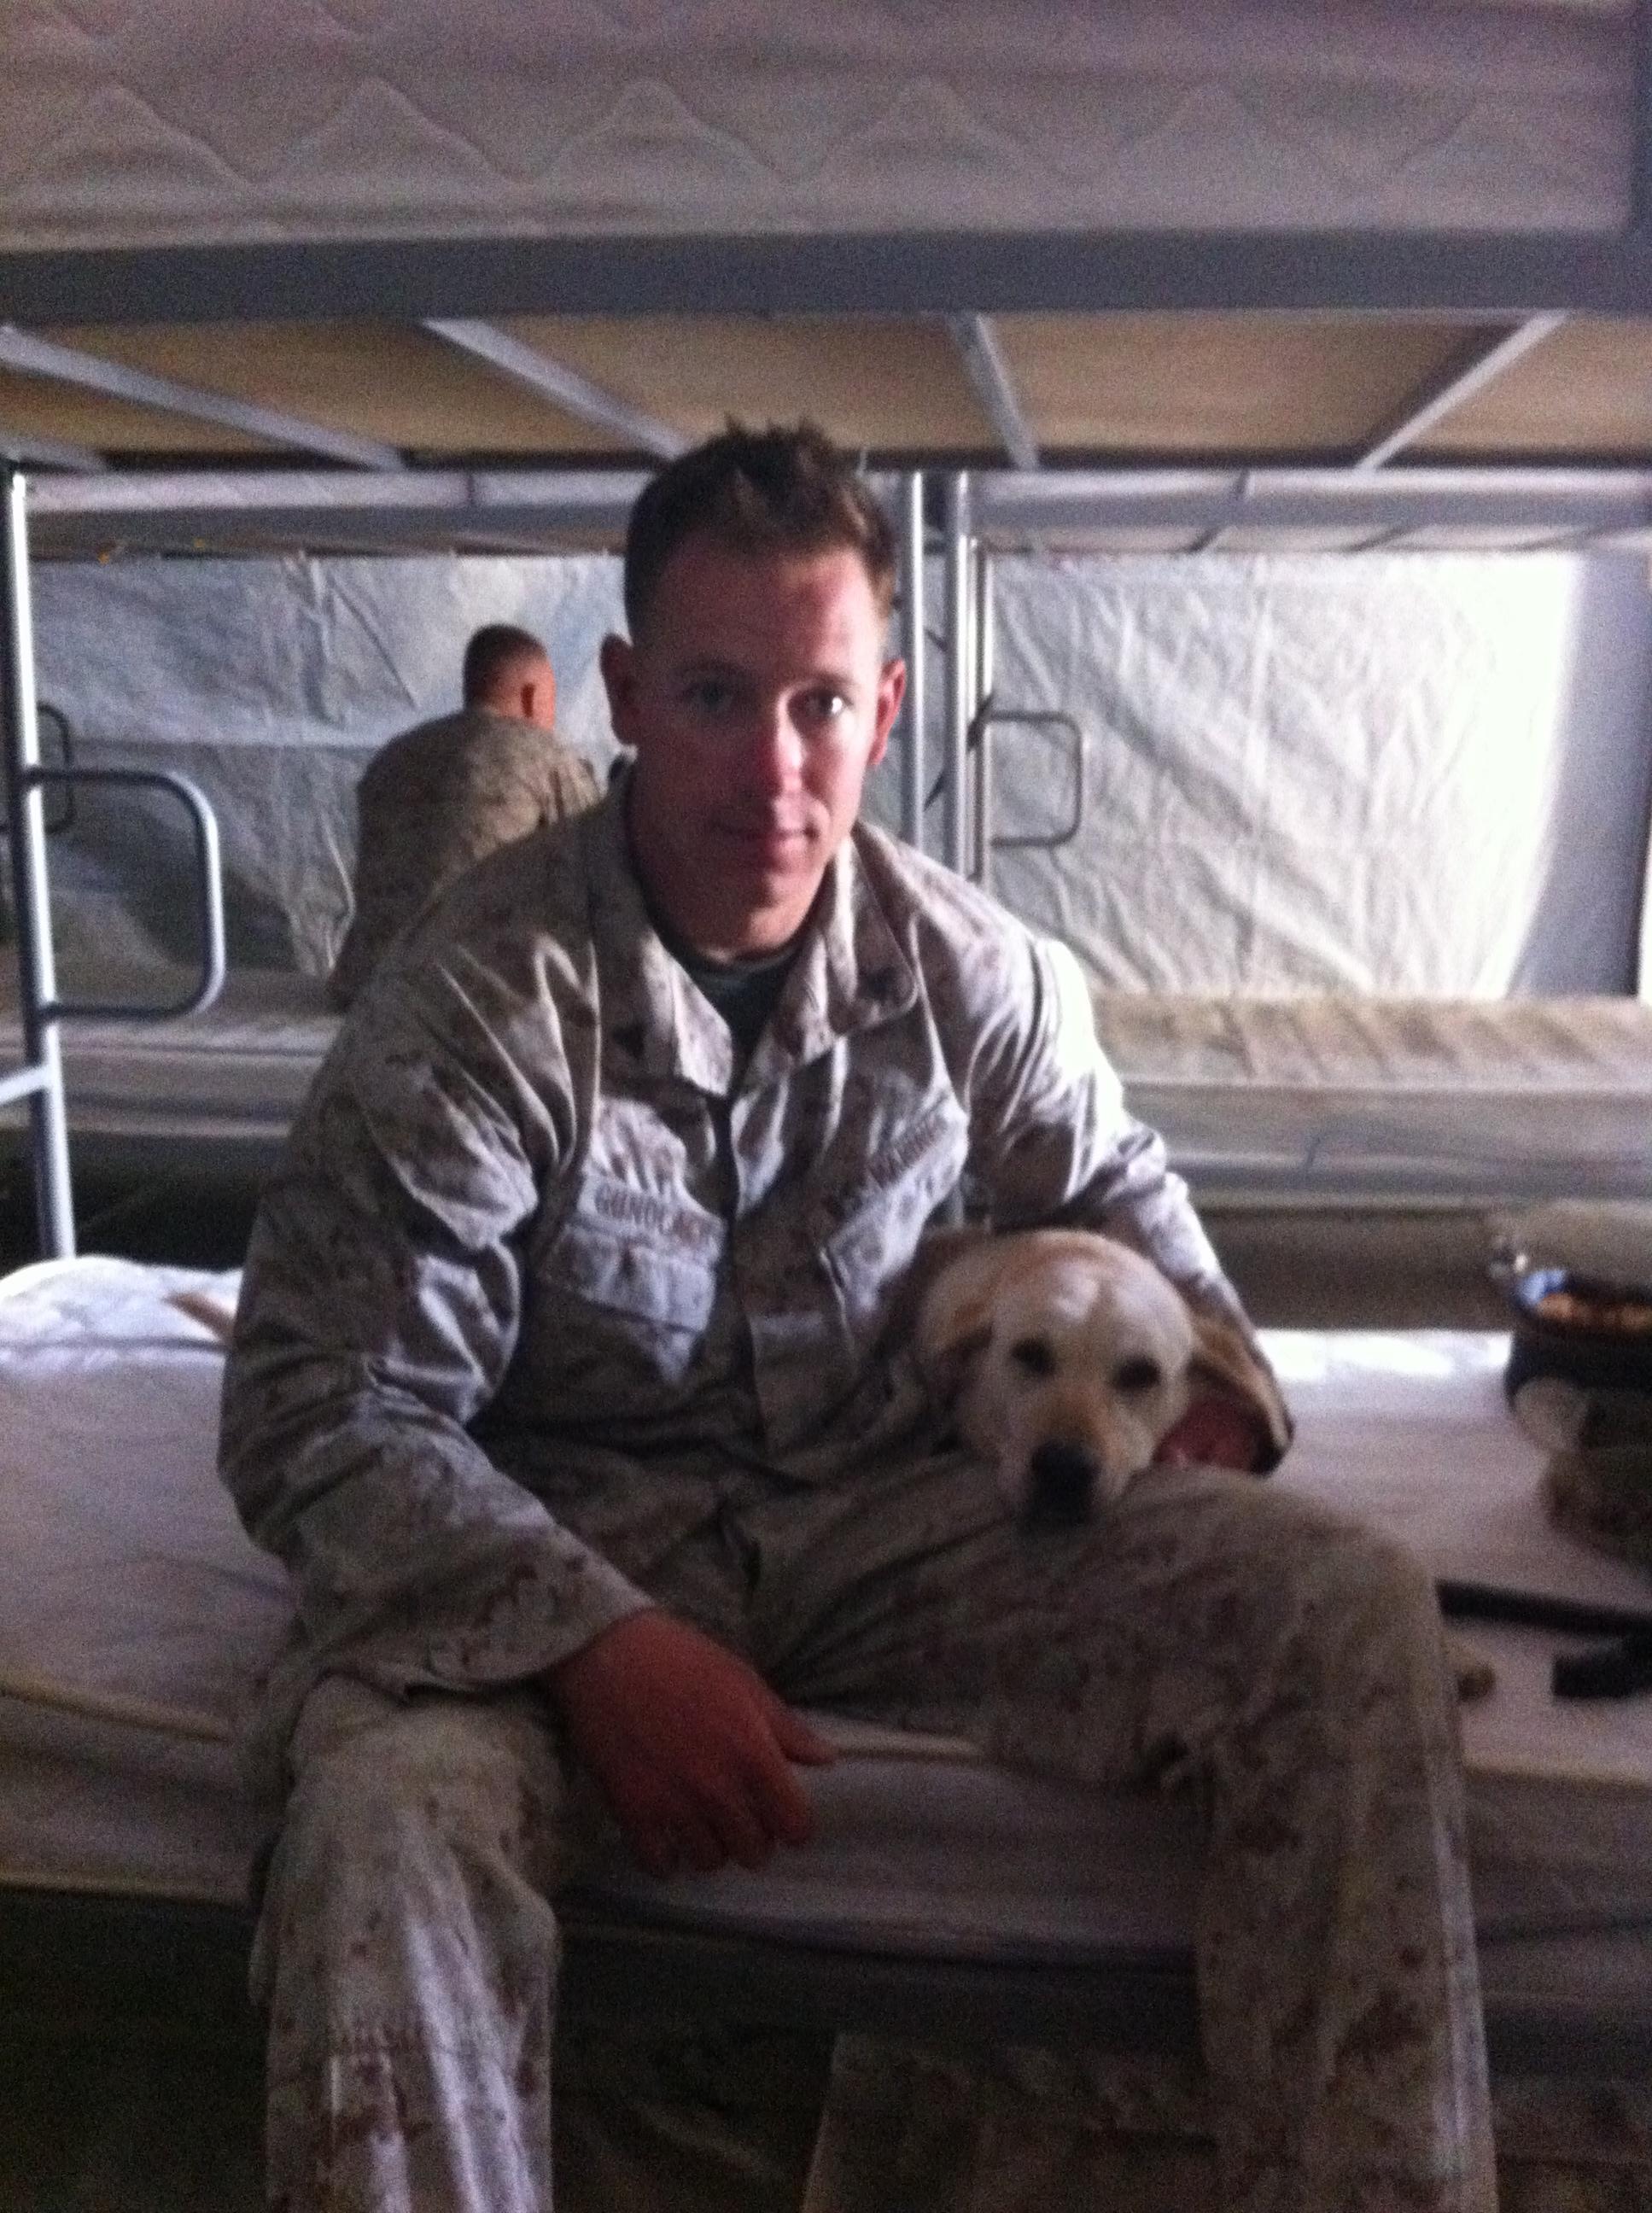 Sgt. Gundlach and Casey on duty. Photo courtesy of Ross Gundlach.